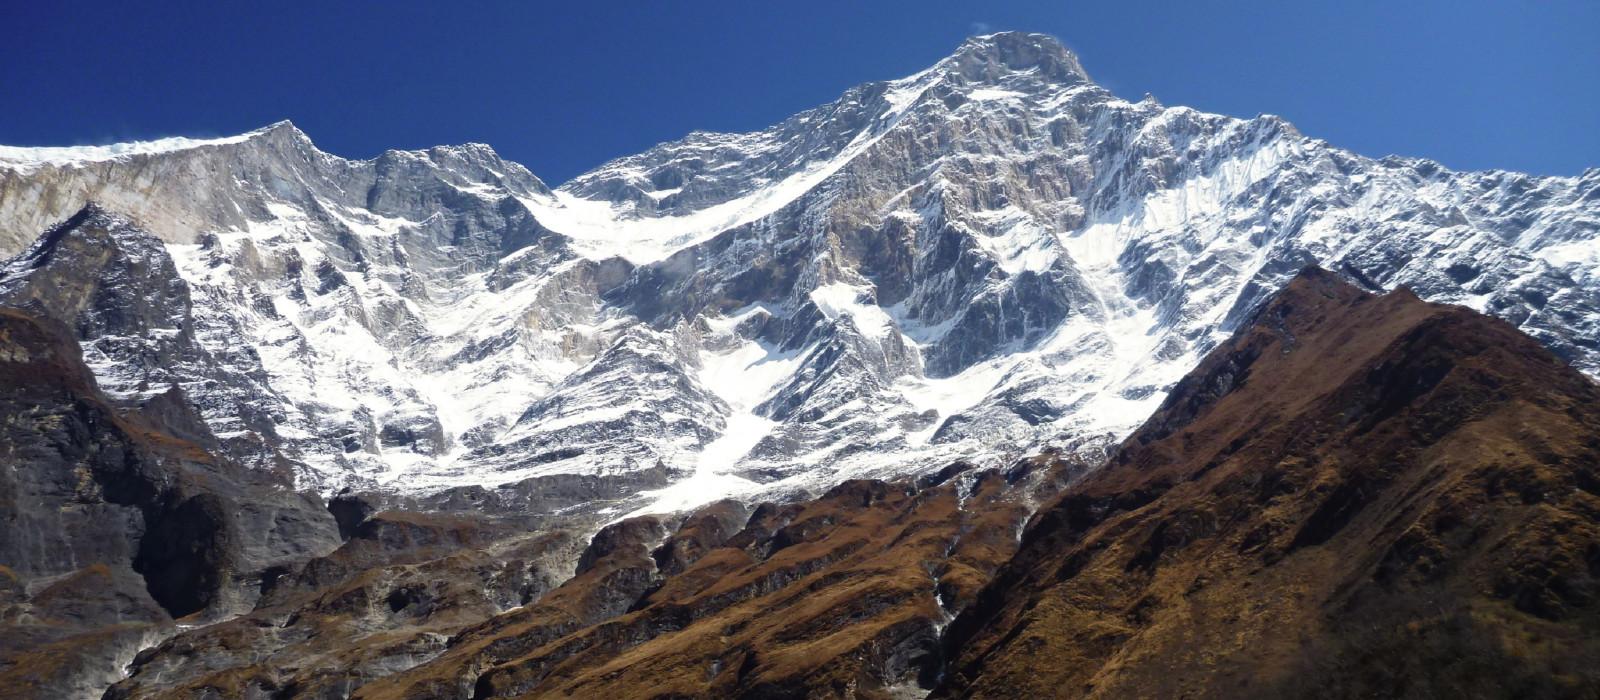 Destination Annapurna region Nepal